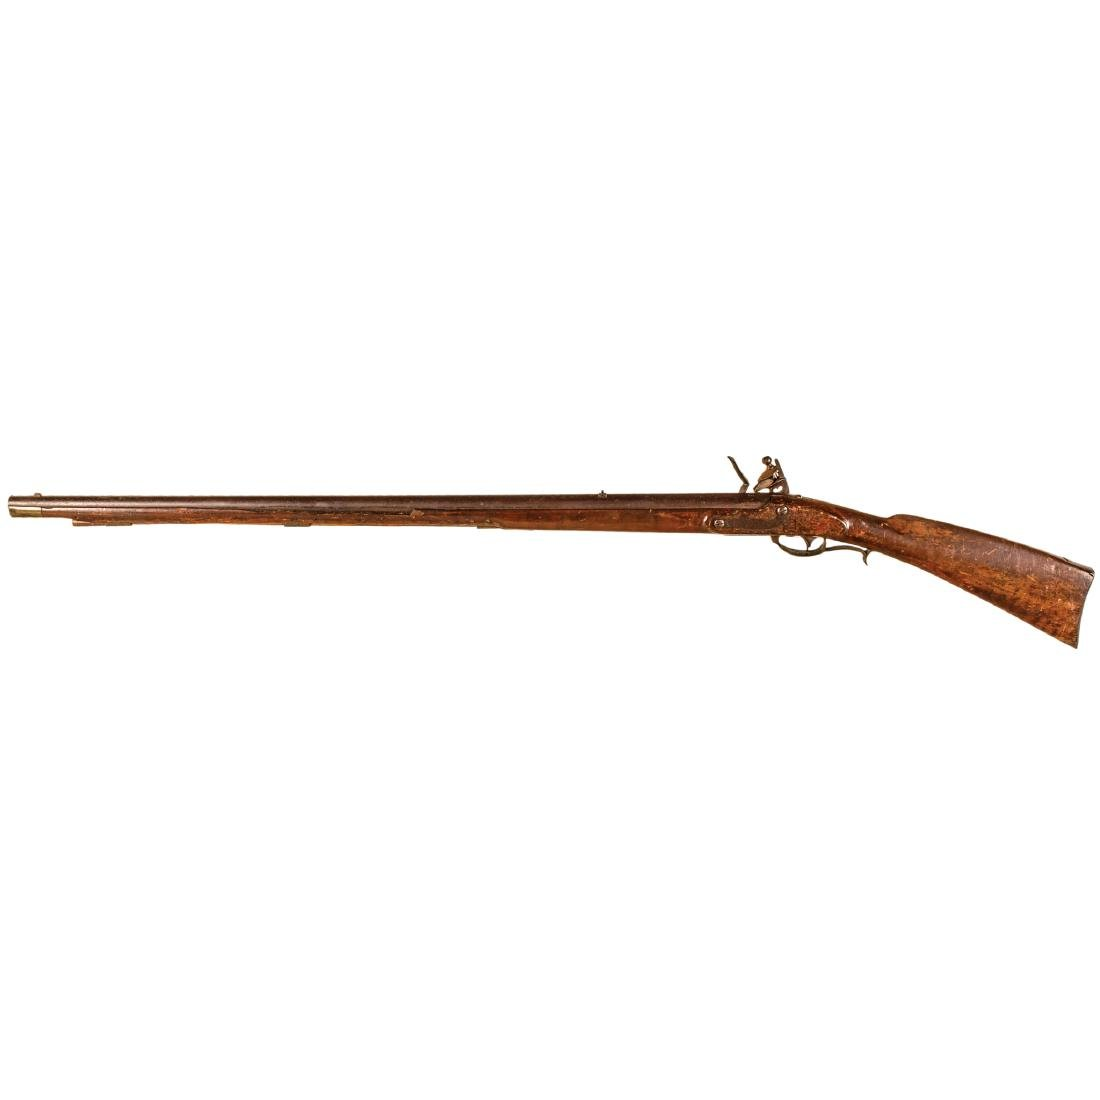 US Model 1817 Flintlock Rifle, Nathan Starr + Son